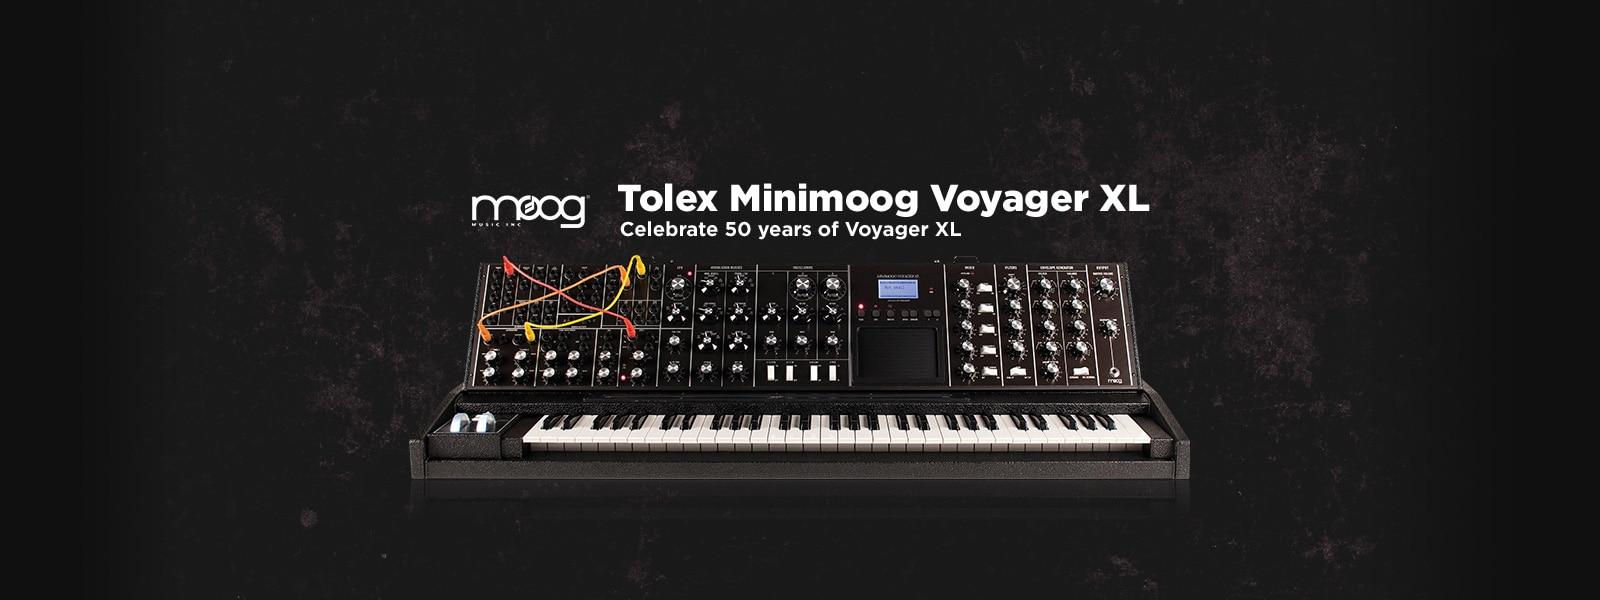 Moog MIDI Keyboard Minimoog Tolex Minimoog Voyager XL